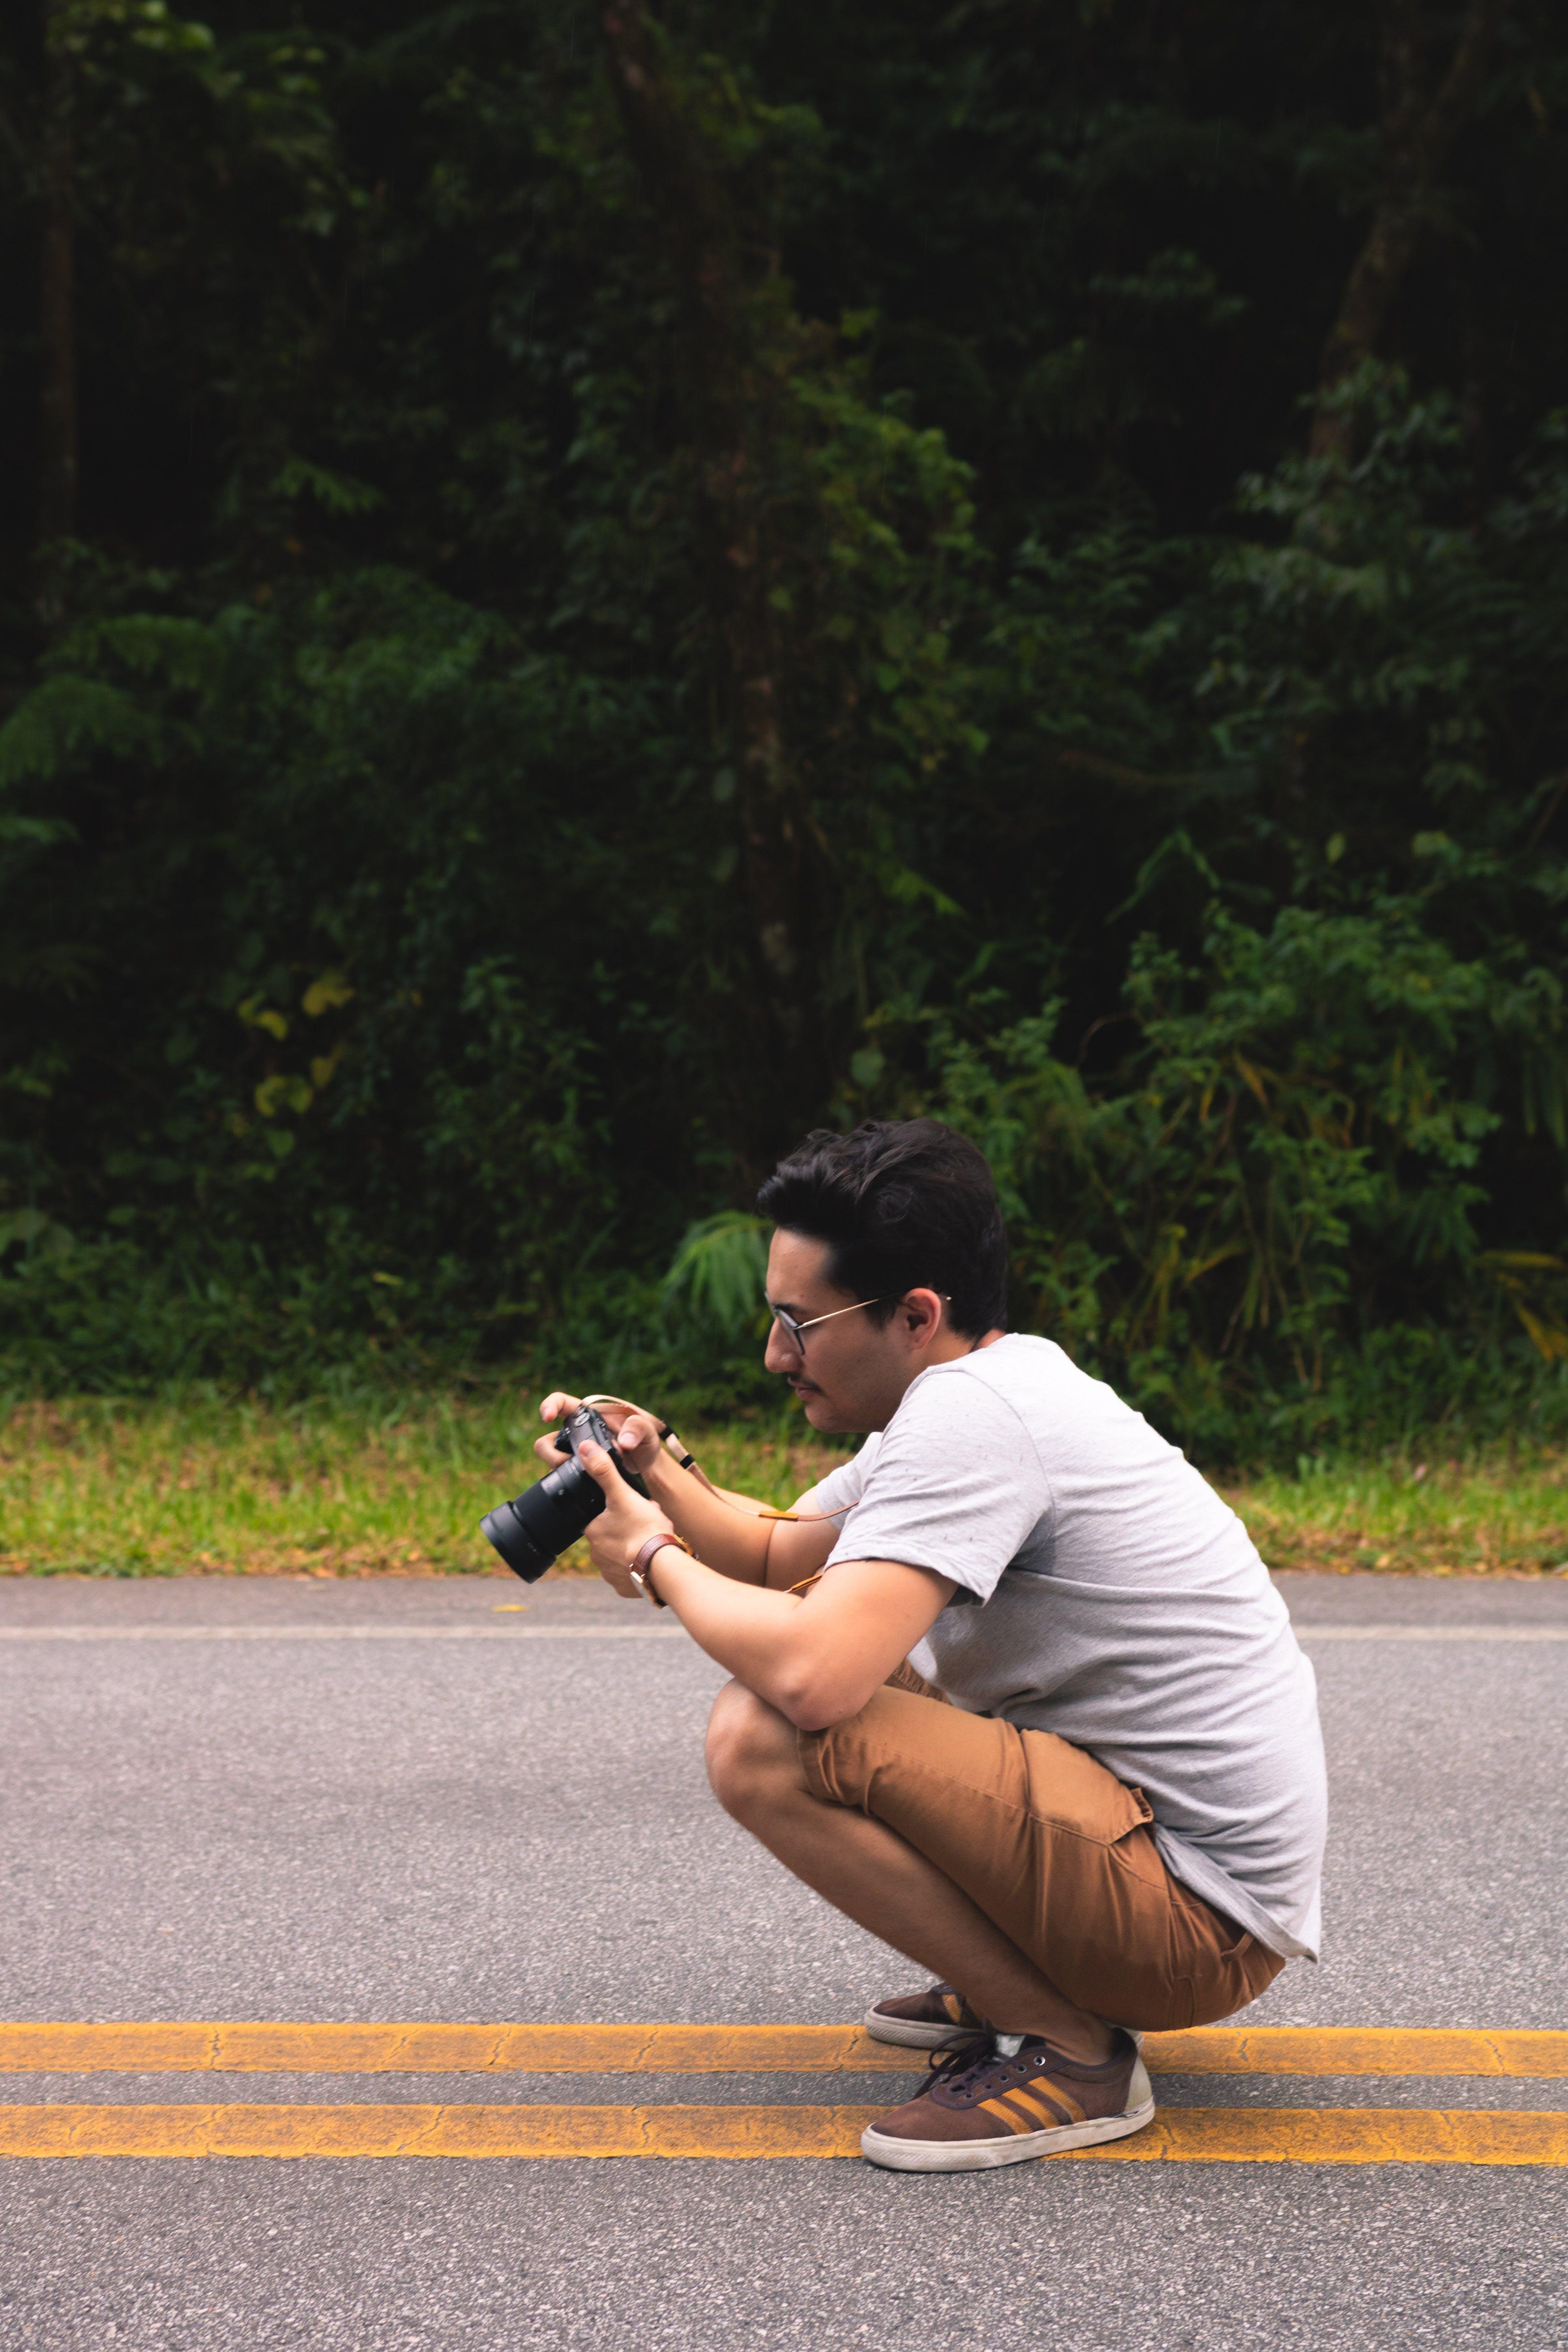 Man Holding Dslr Camera on Road